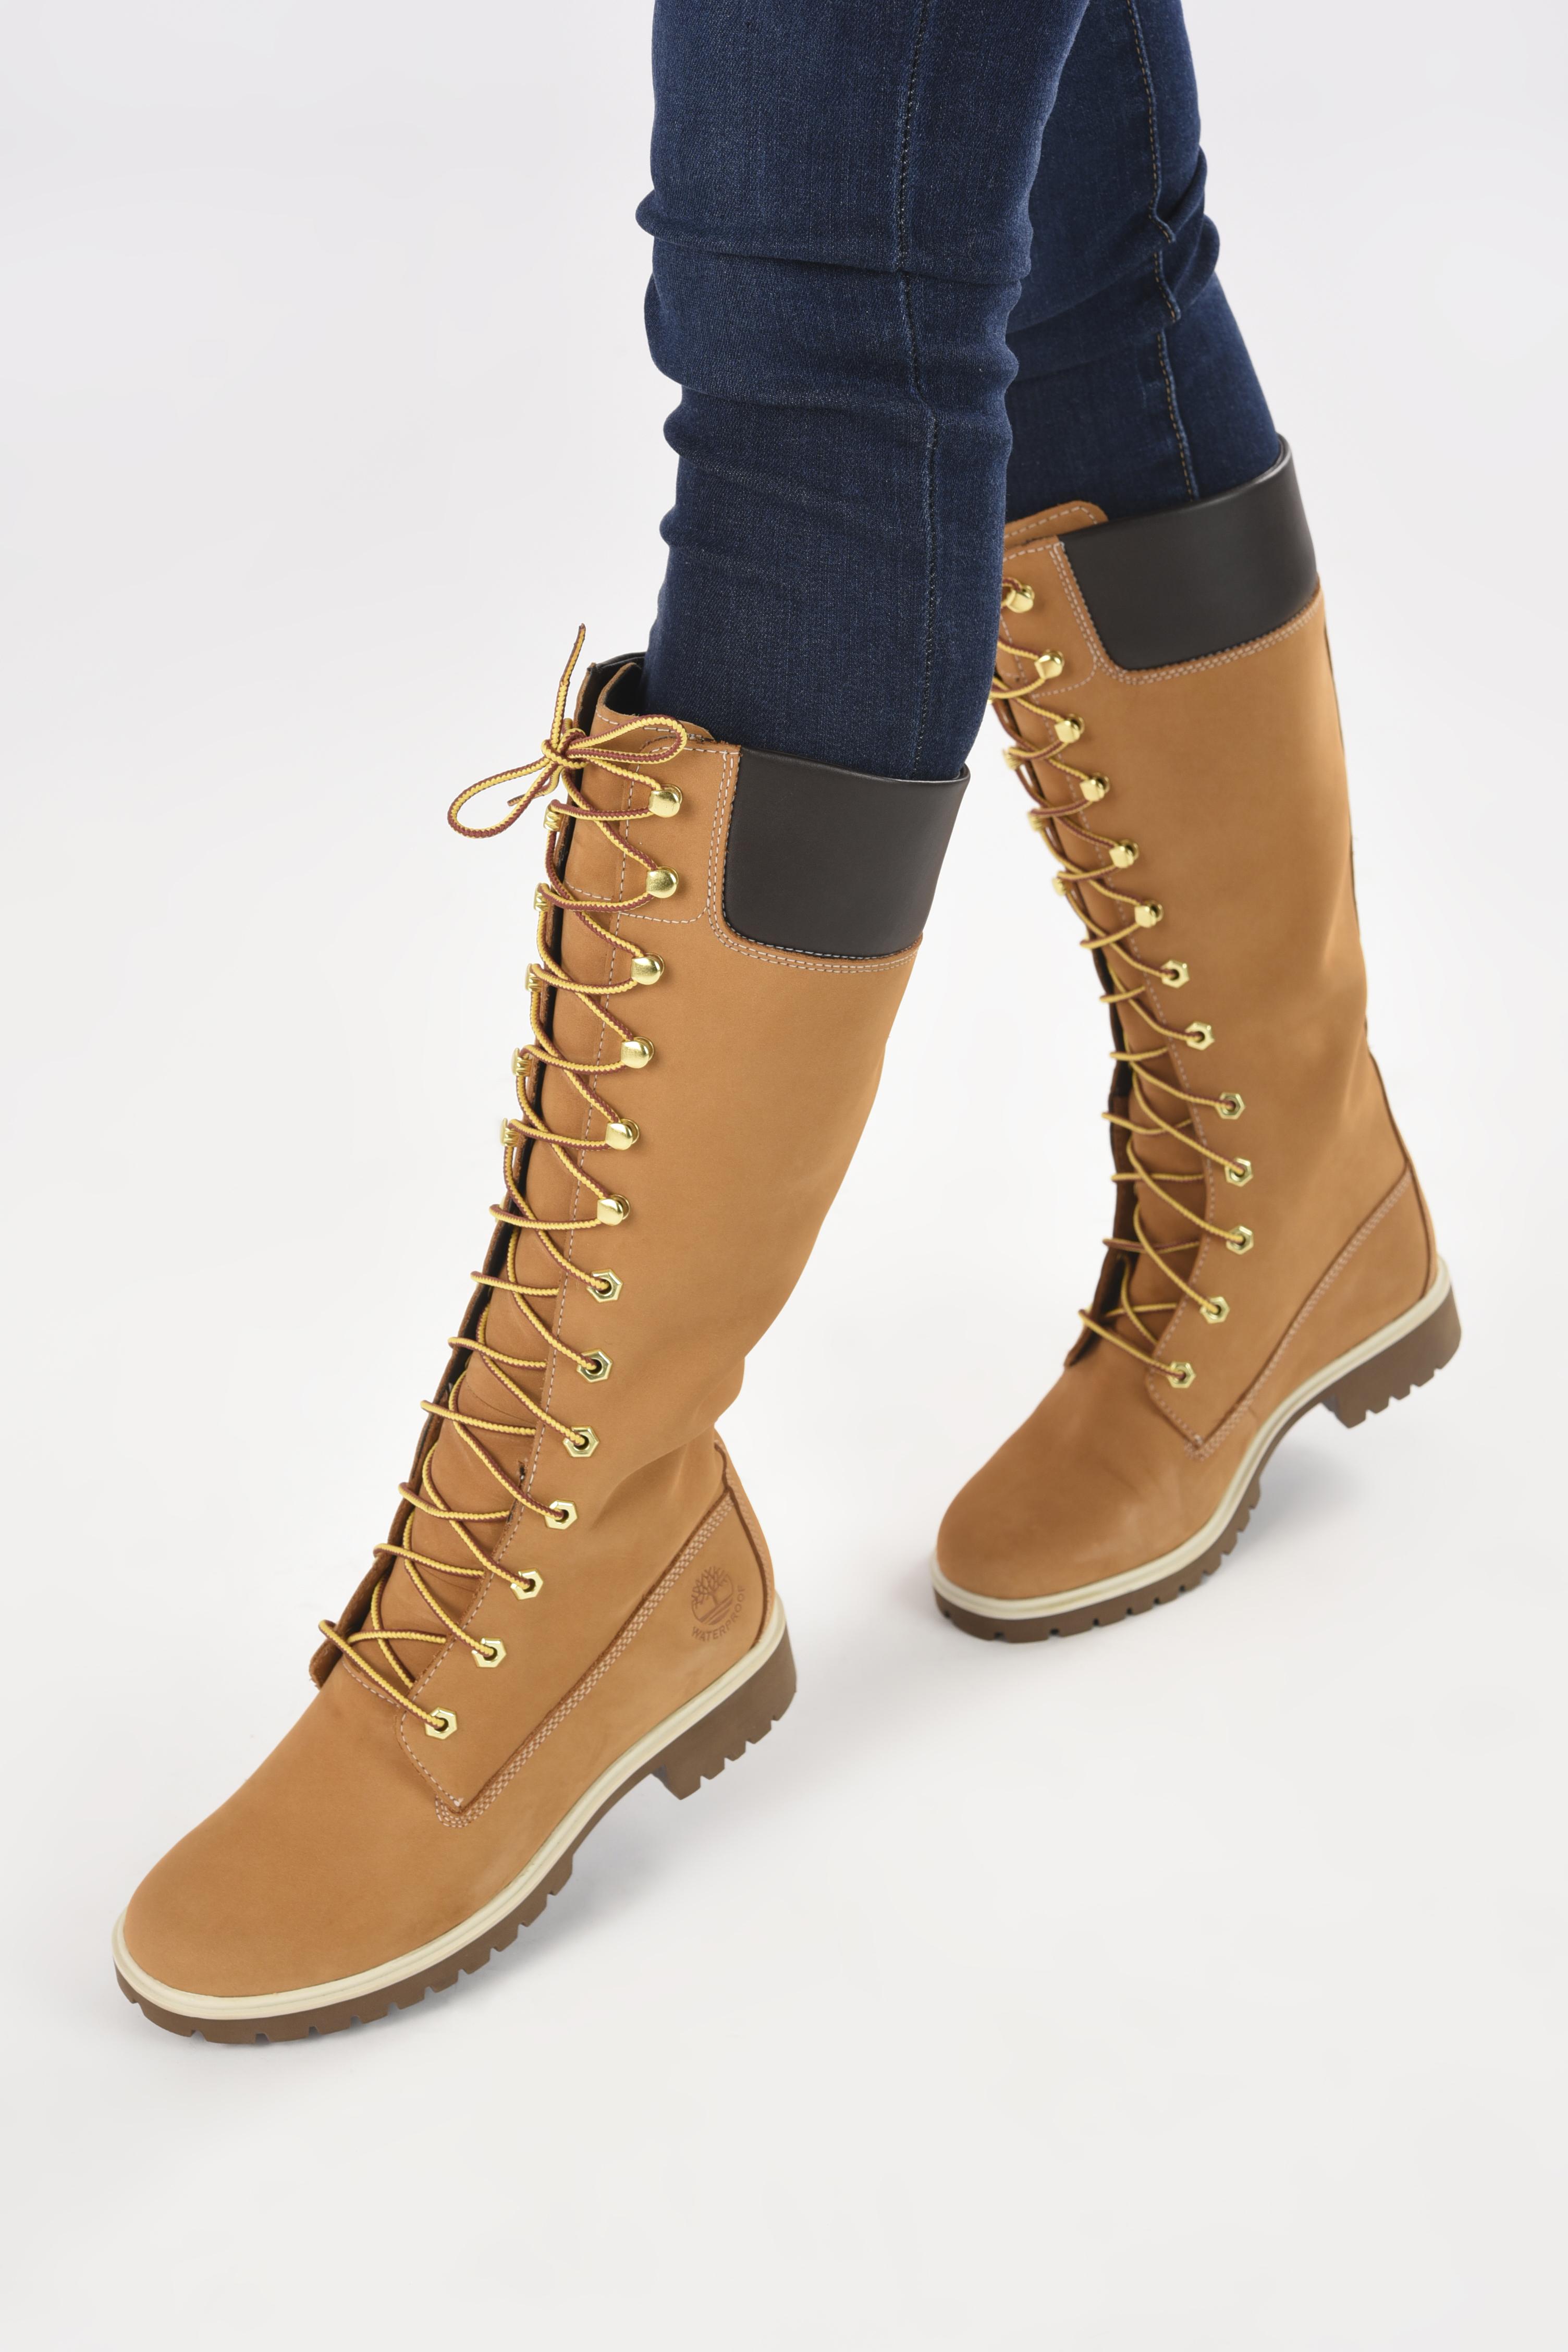 Bottes Timberland Women's Premium 14 inch Jaune vue bas / vue portée sac